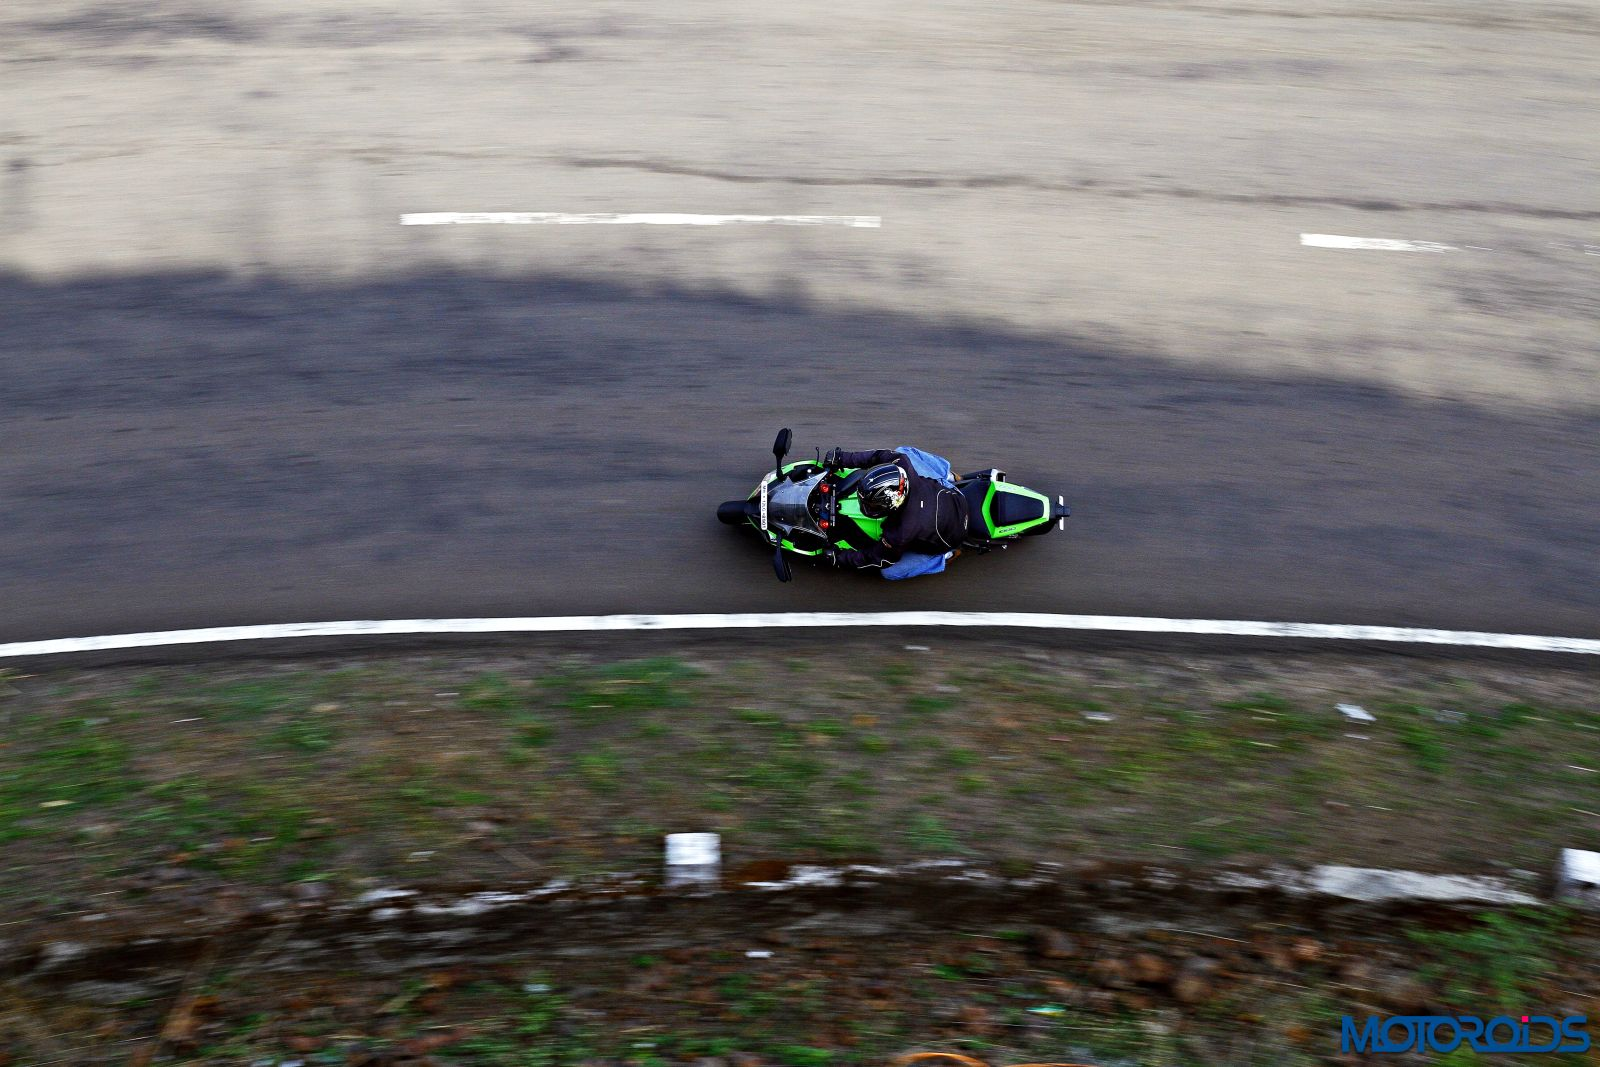 Kawasaki Ninja ZX-14R-riding top